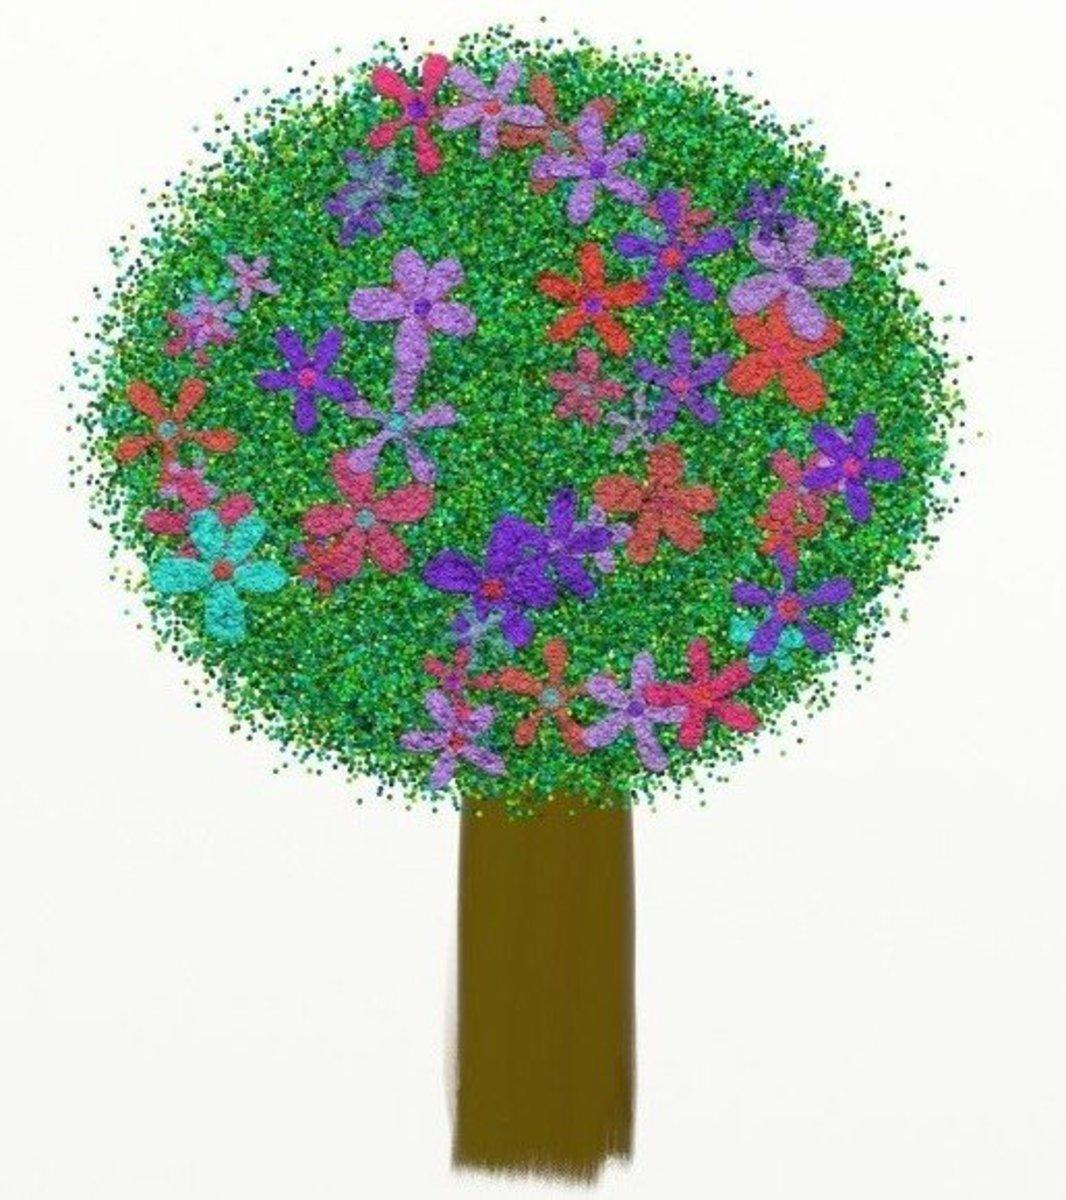 Tree with Purple, Orange and Aqua Flowers